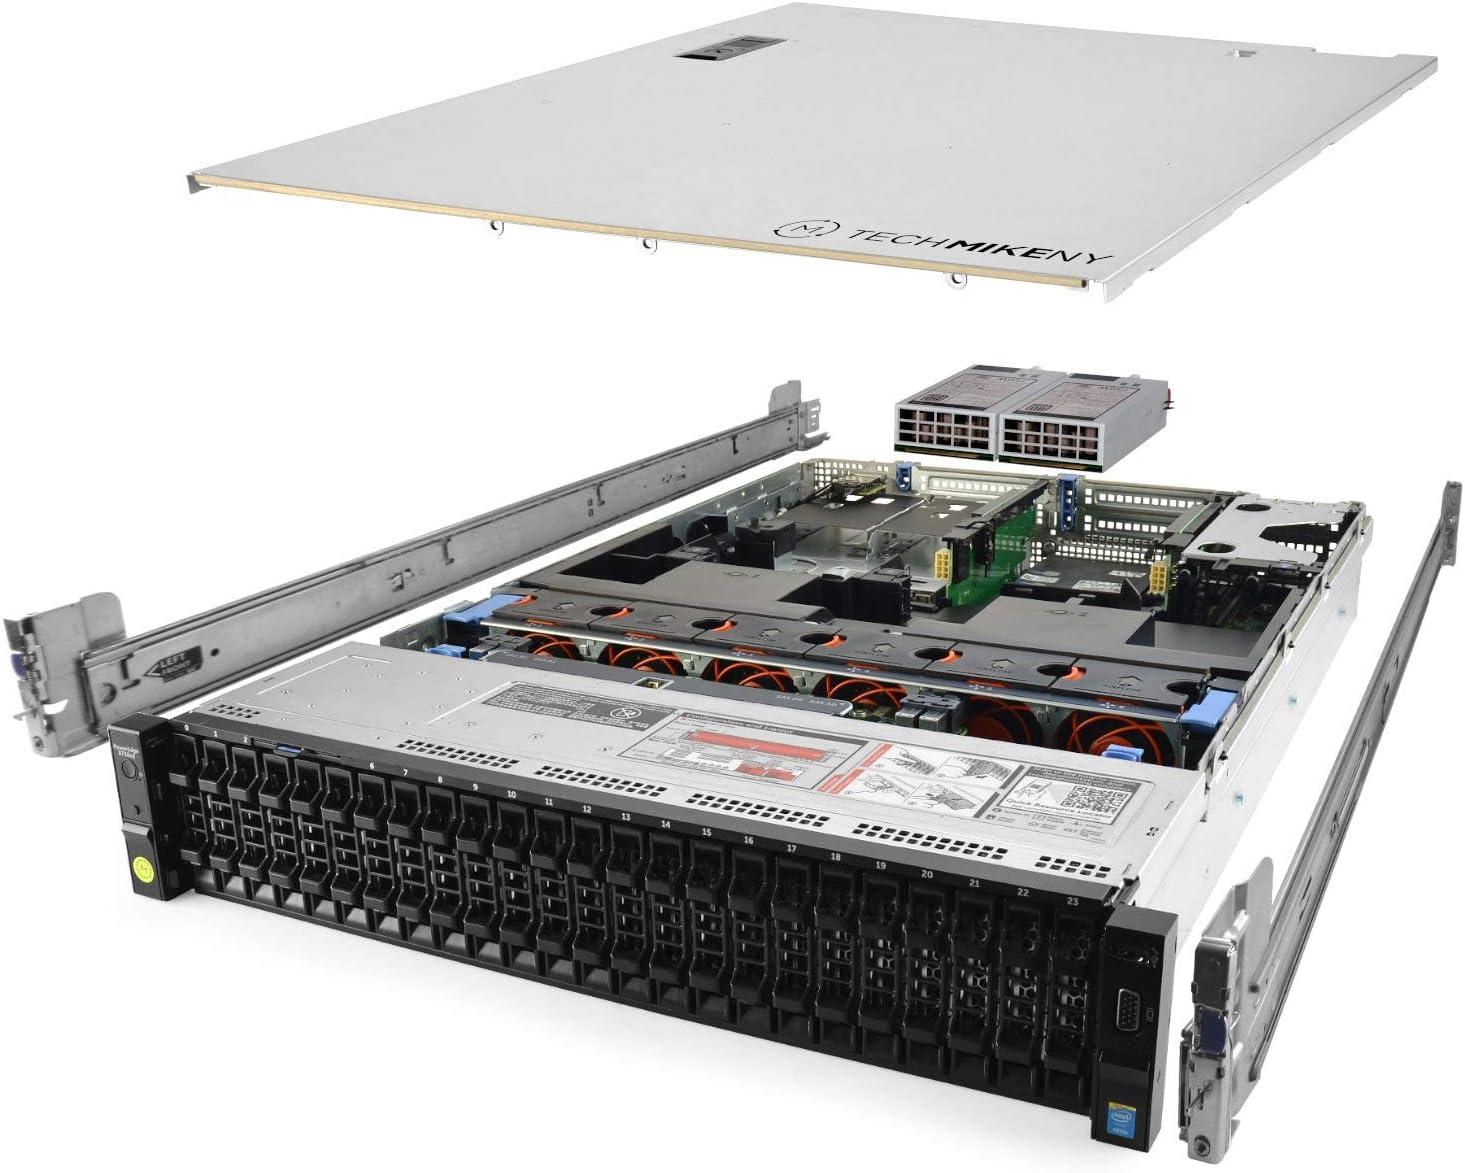 TechMikeNY Server 2X E5-2680v3 2.50Ghz Rails Sale Special Max 48% OFF Price 256GB H730 24-Core